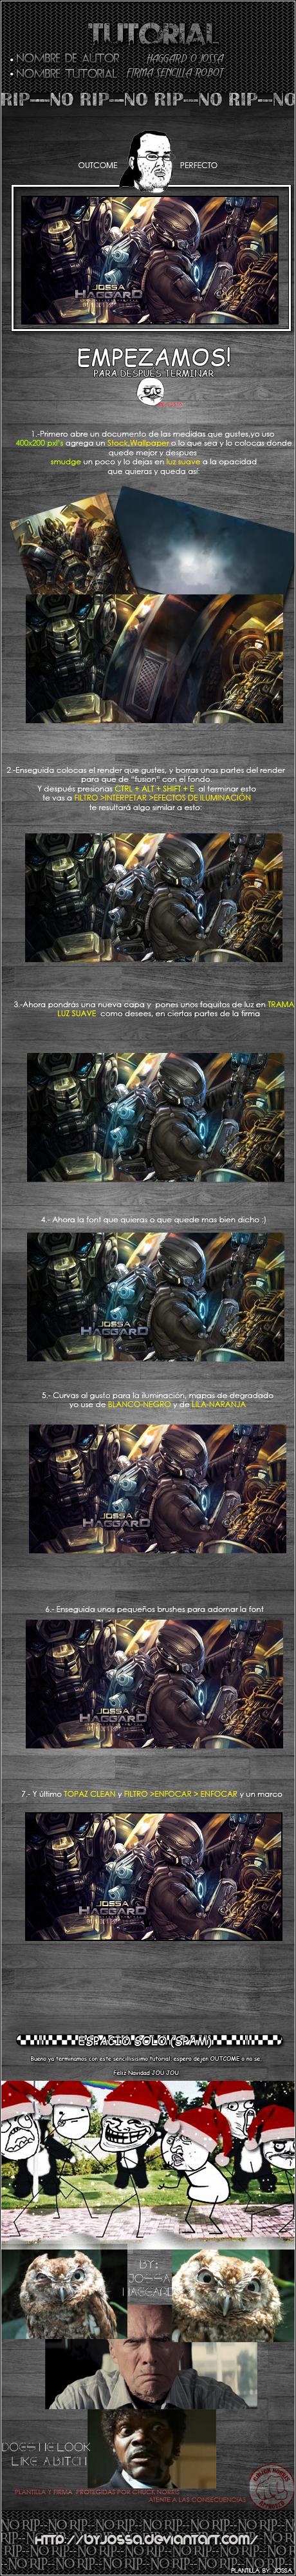 [TUTORIAL] Firma de Robot Tutorial_firma_robot_sencilla_by_byjossa-d4irr0u